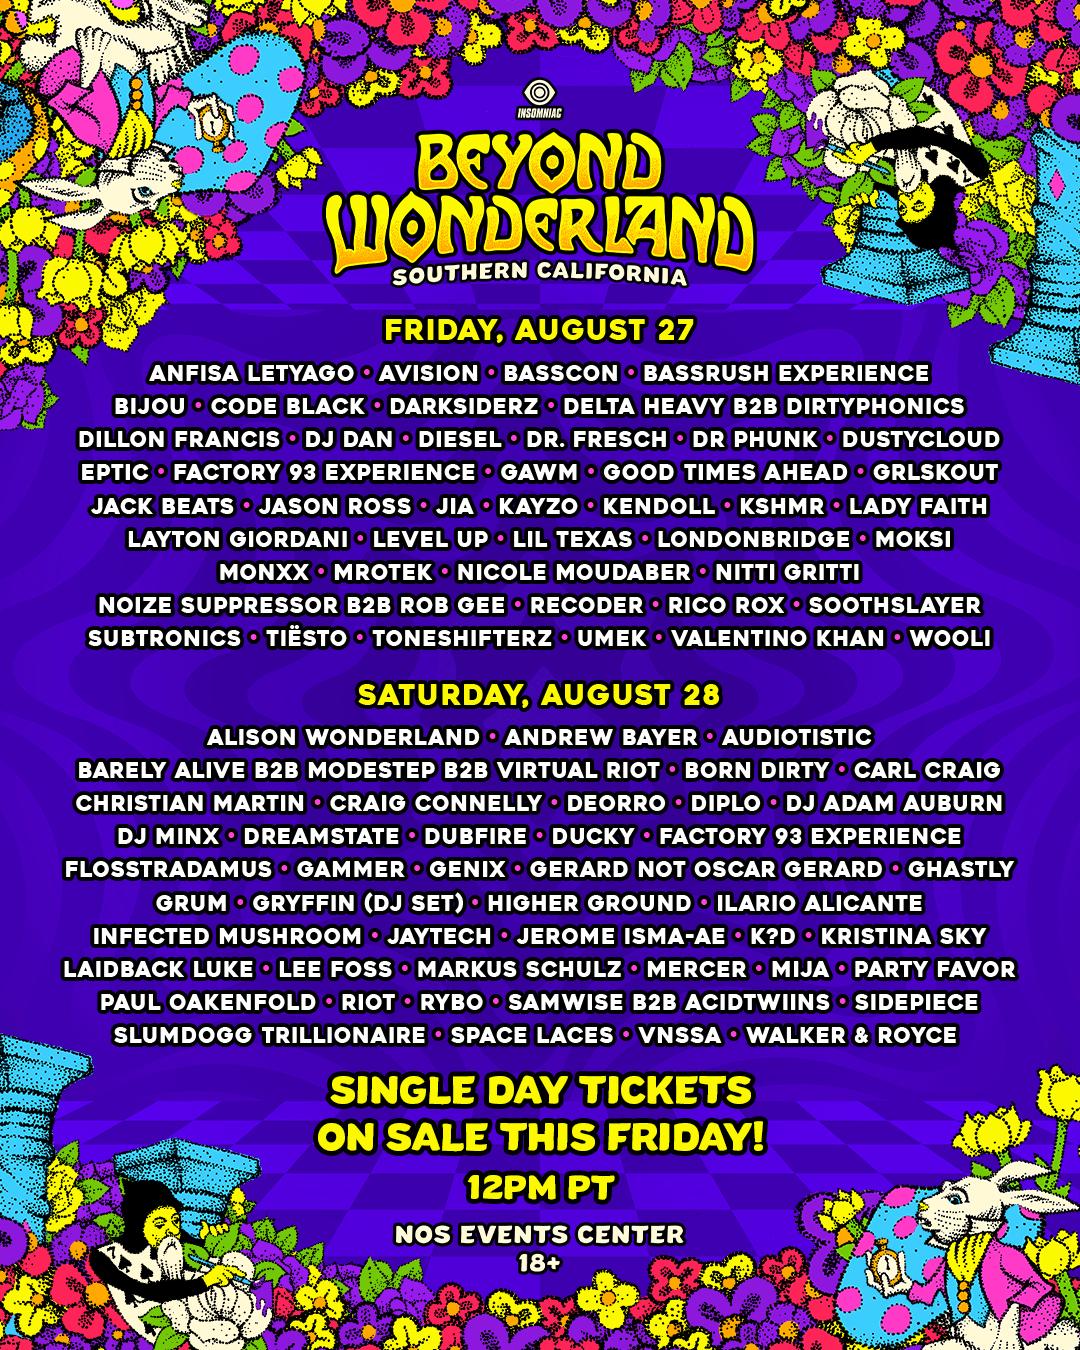 Beyond Wonderland 2021 lineup